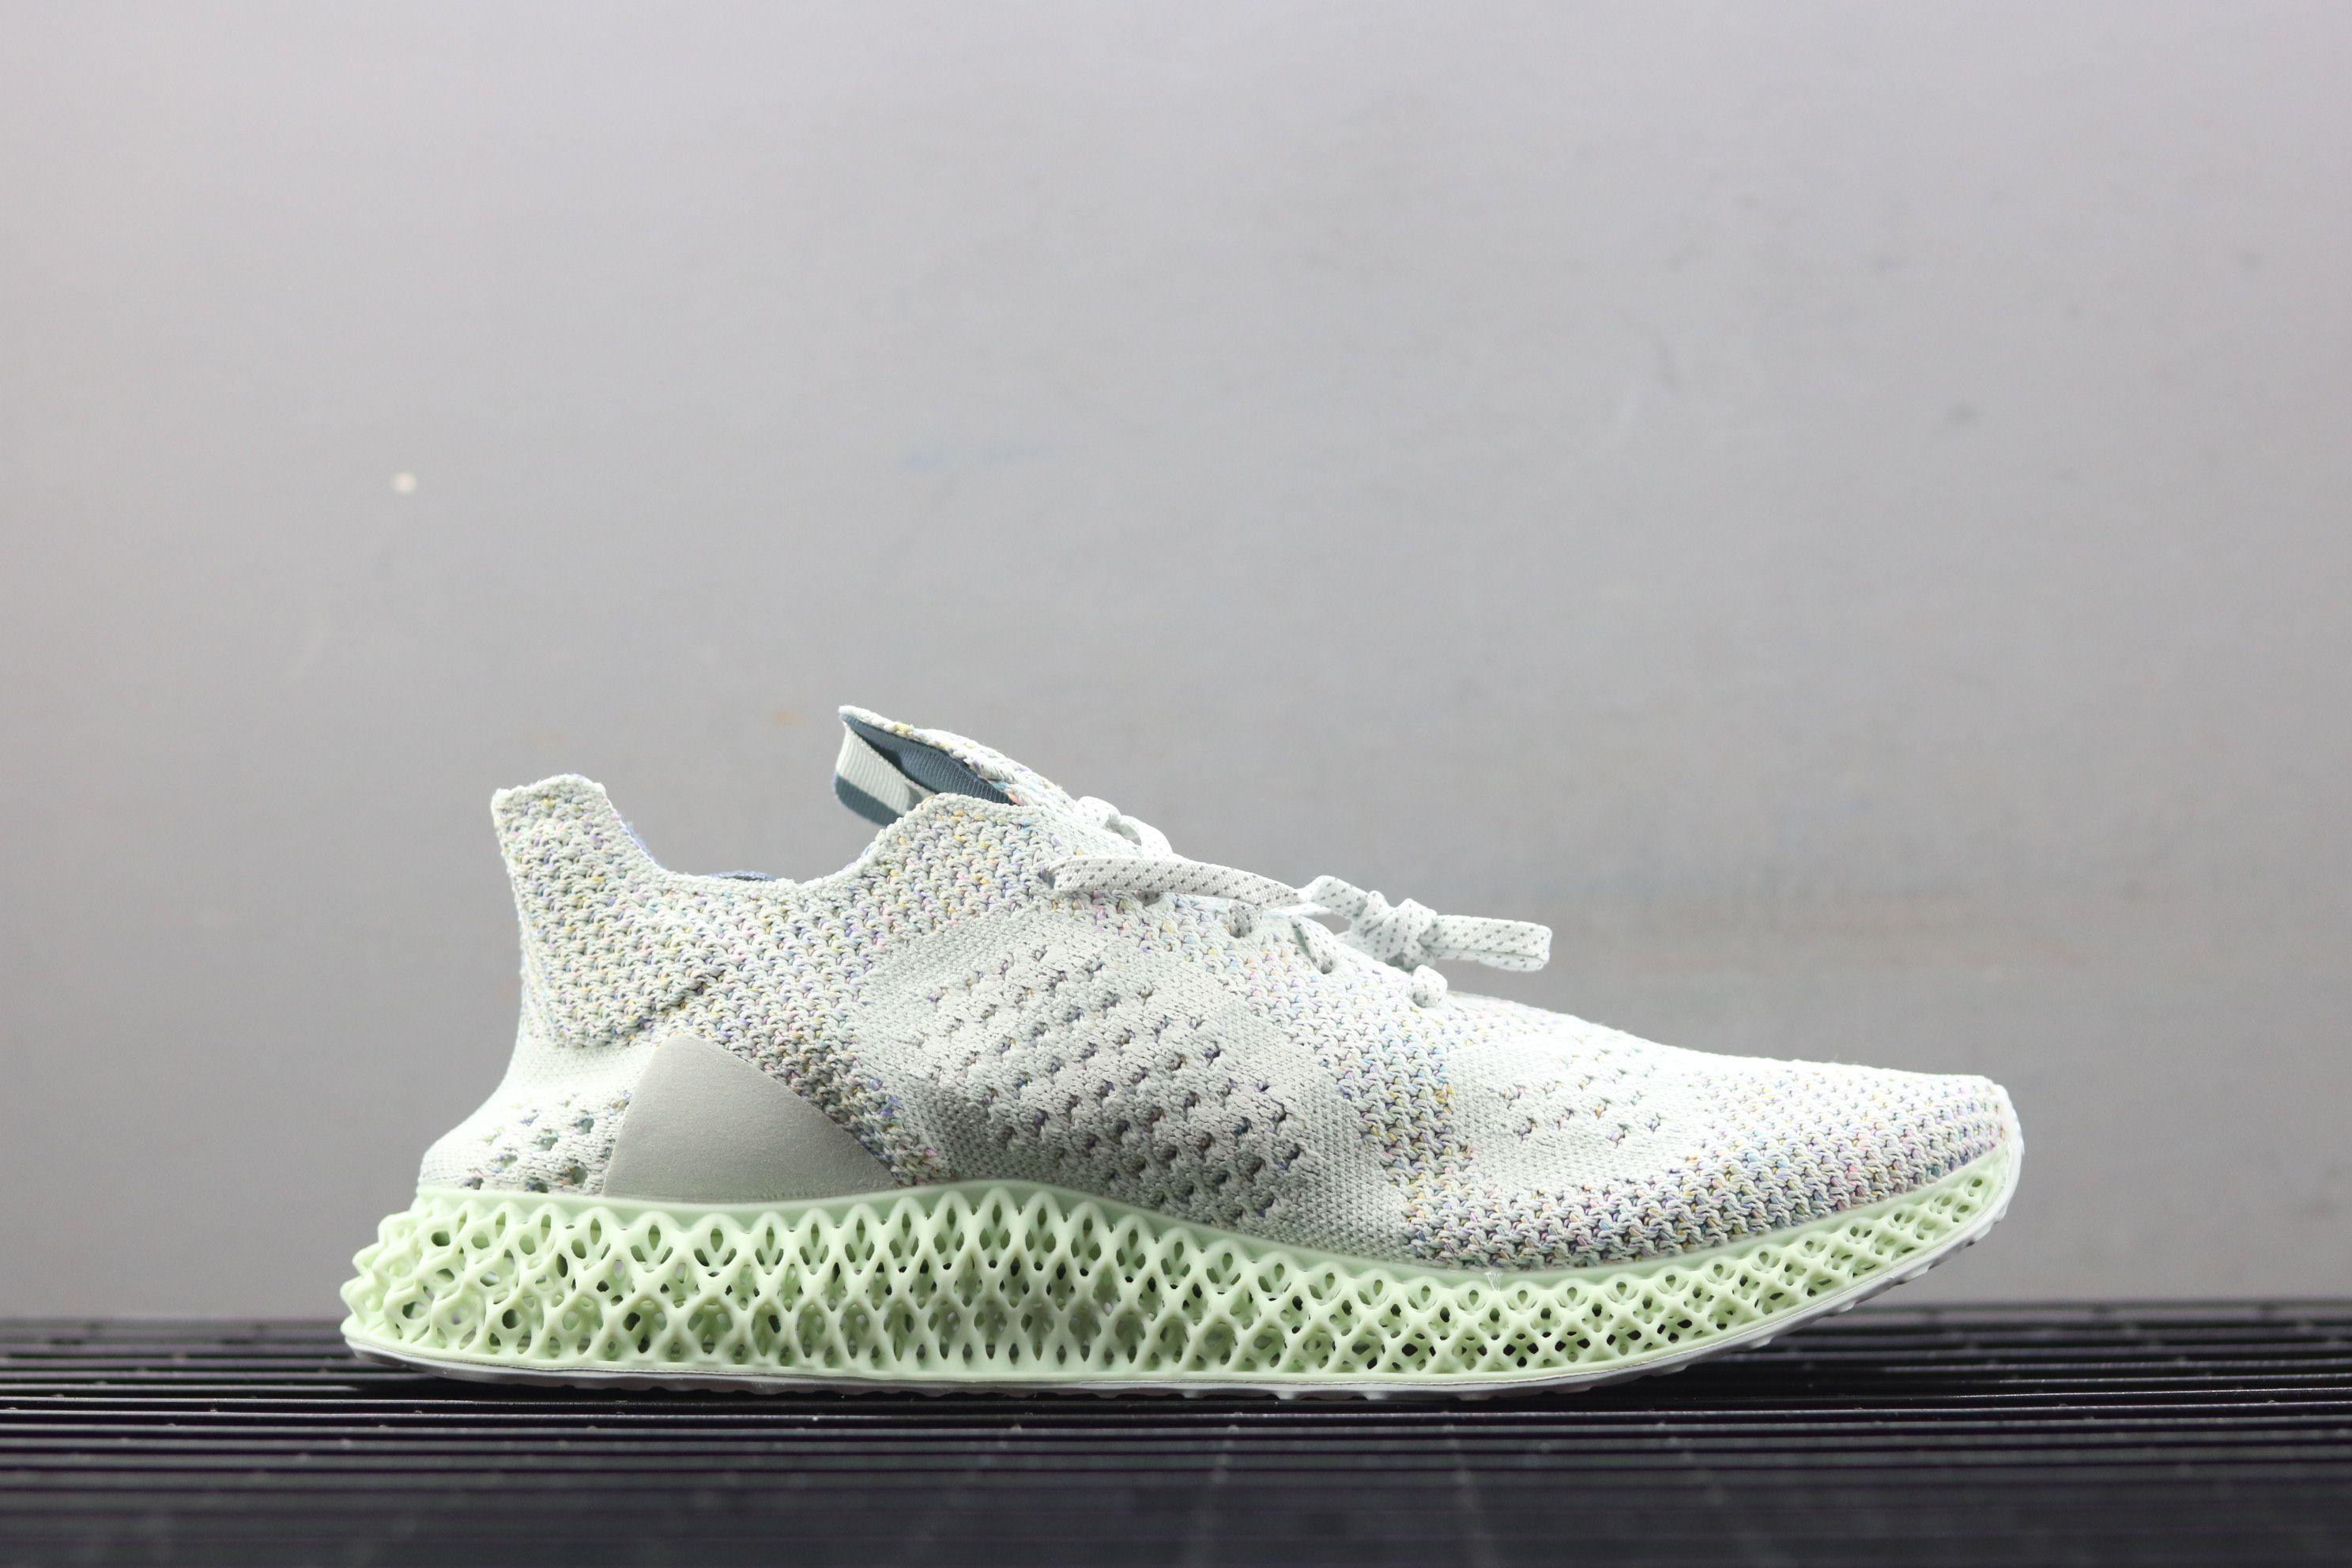 Invincible x Adidas Consortium Runner 4D White Running